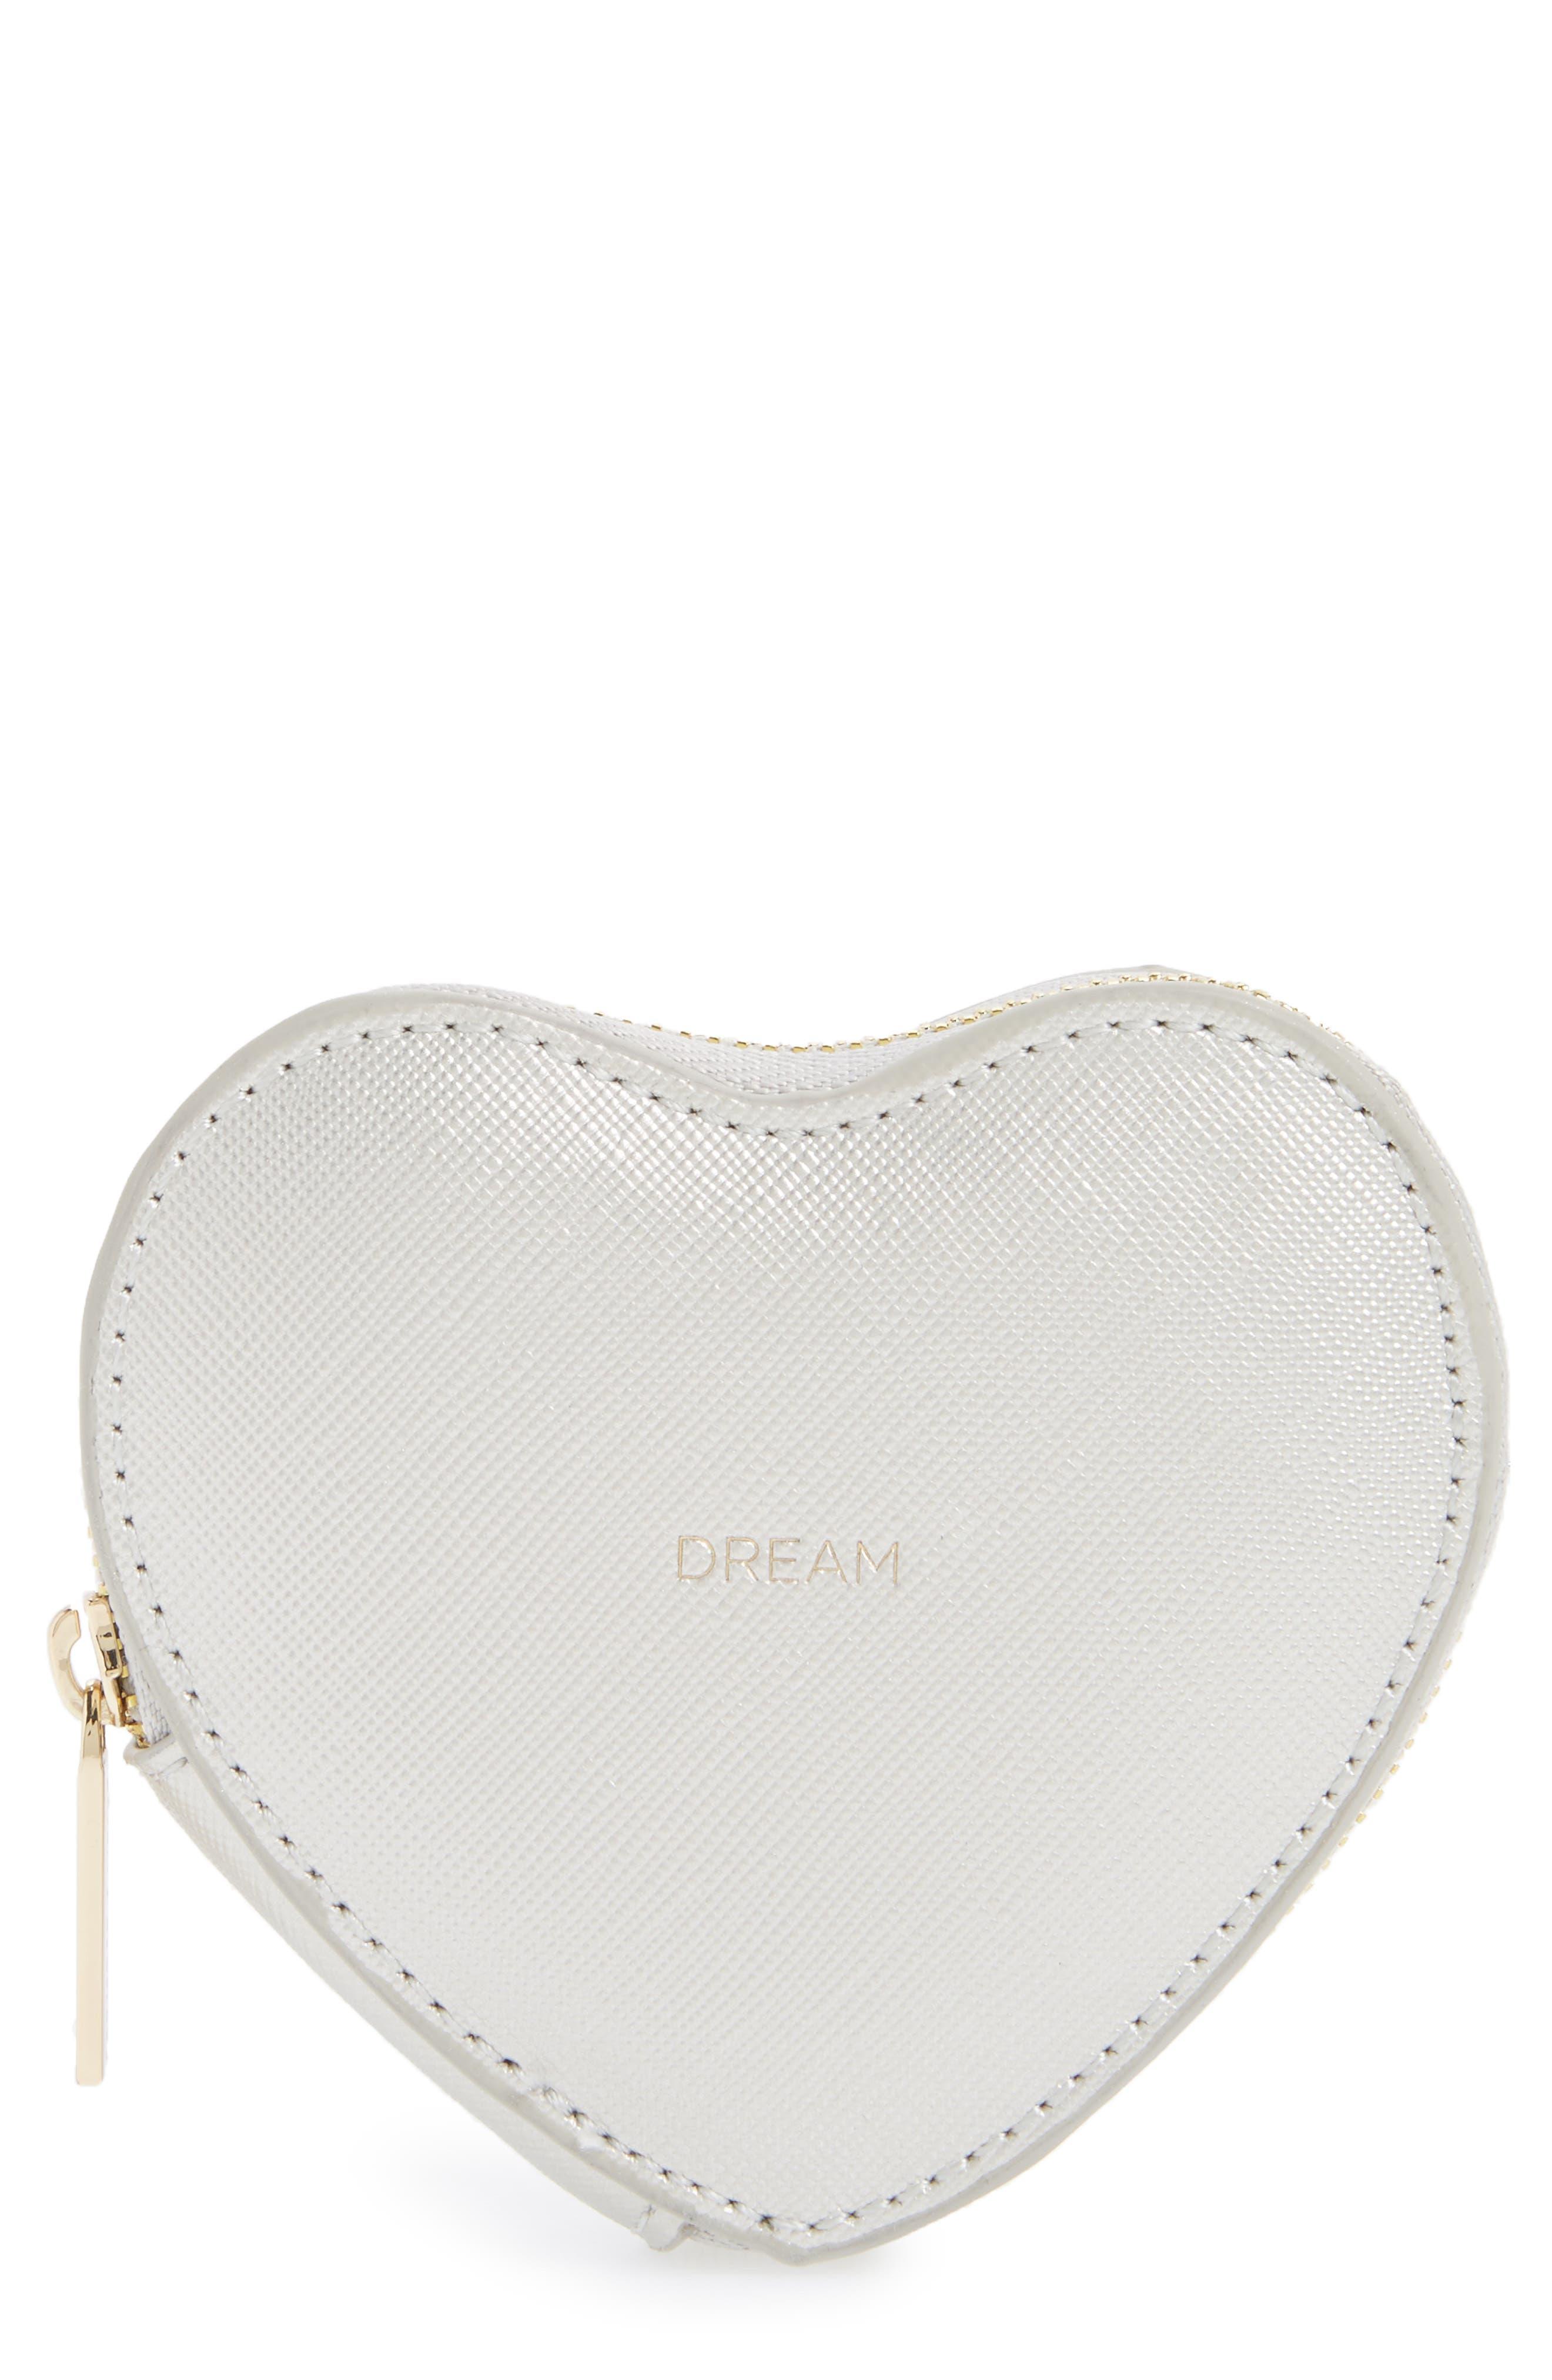 Alternate Image 1 Selected - Estella Bartlett Heart Dream Faux Leather Coin Purse